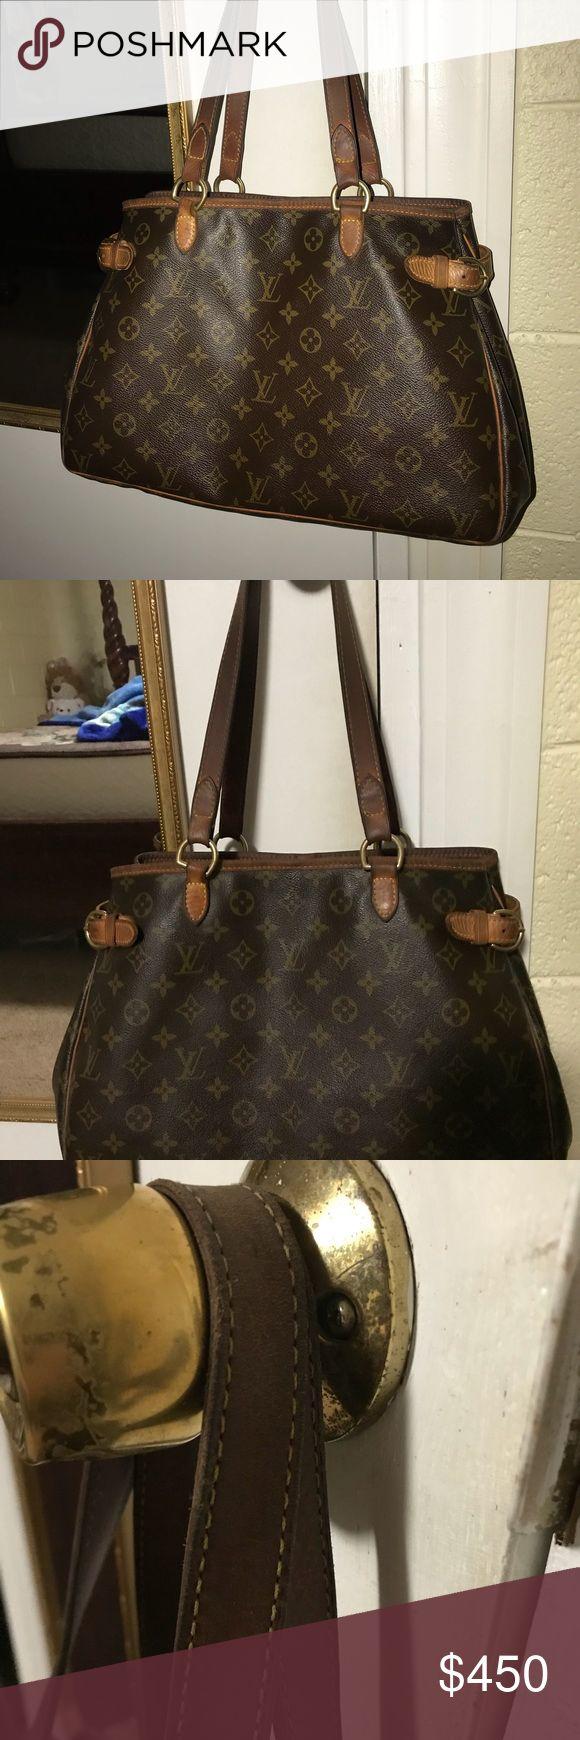 Real Louis Vuitton bag good condition no holes Use condition see pics Louis Vuitton Bags Shoulder Bags